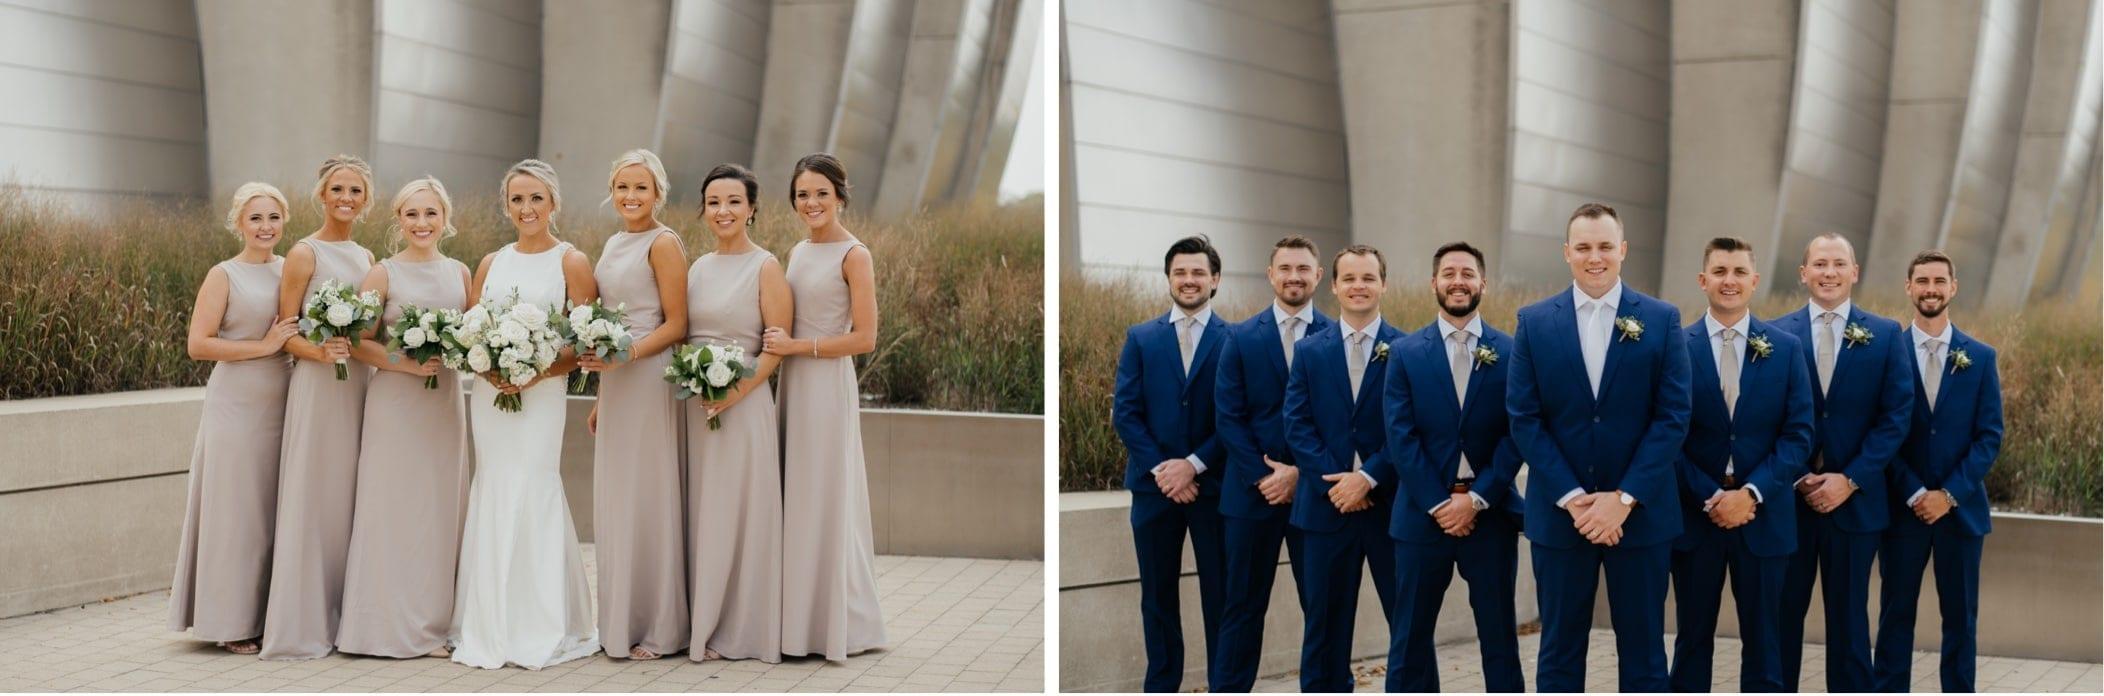 bridal party portraits kauffman center